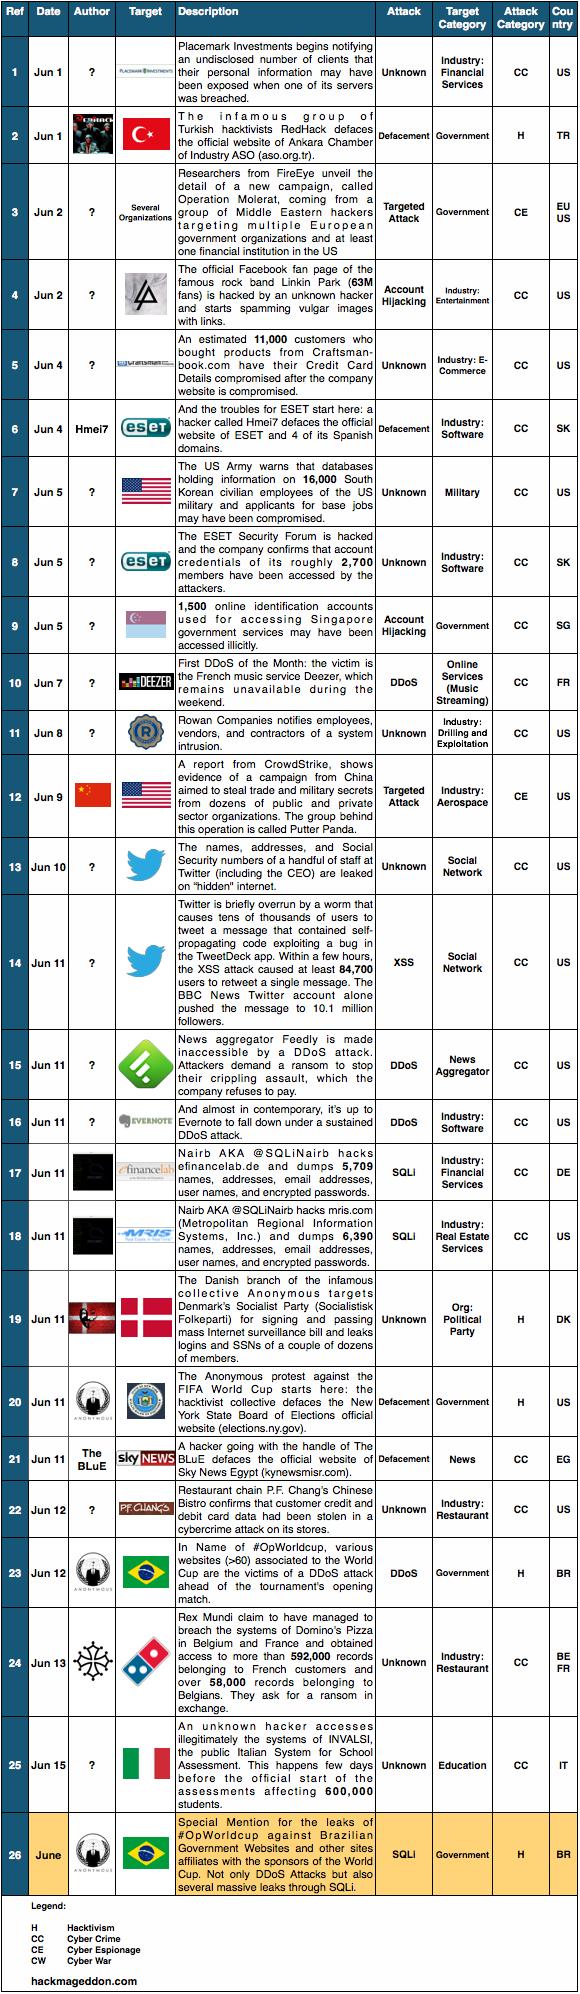 1-15 June 2014 Cyber Attacks Timeline